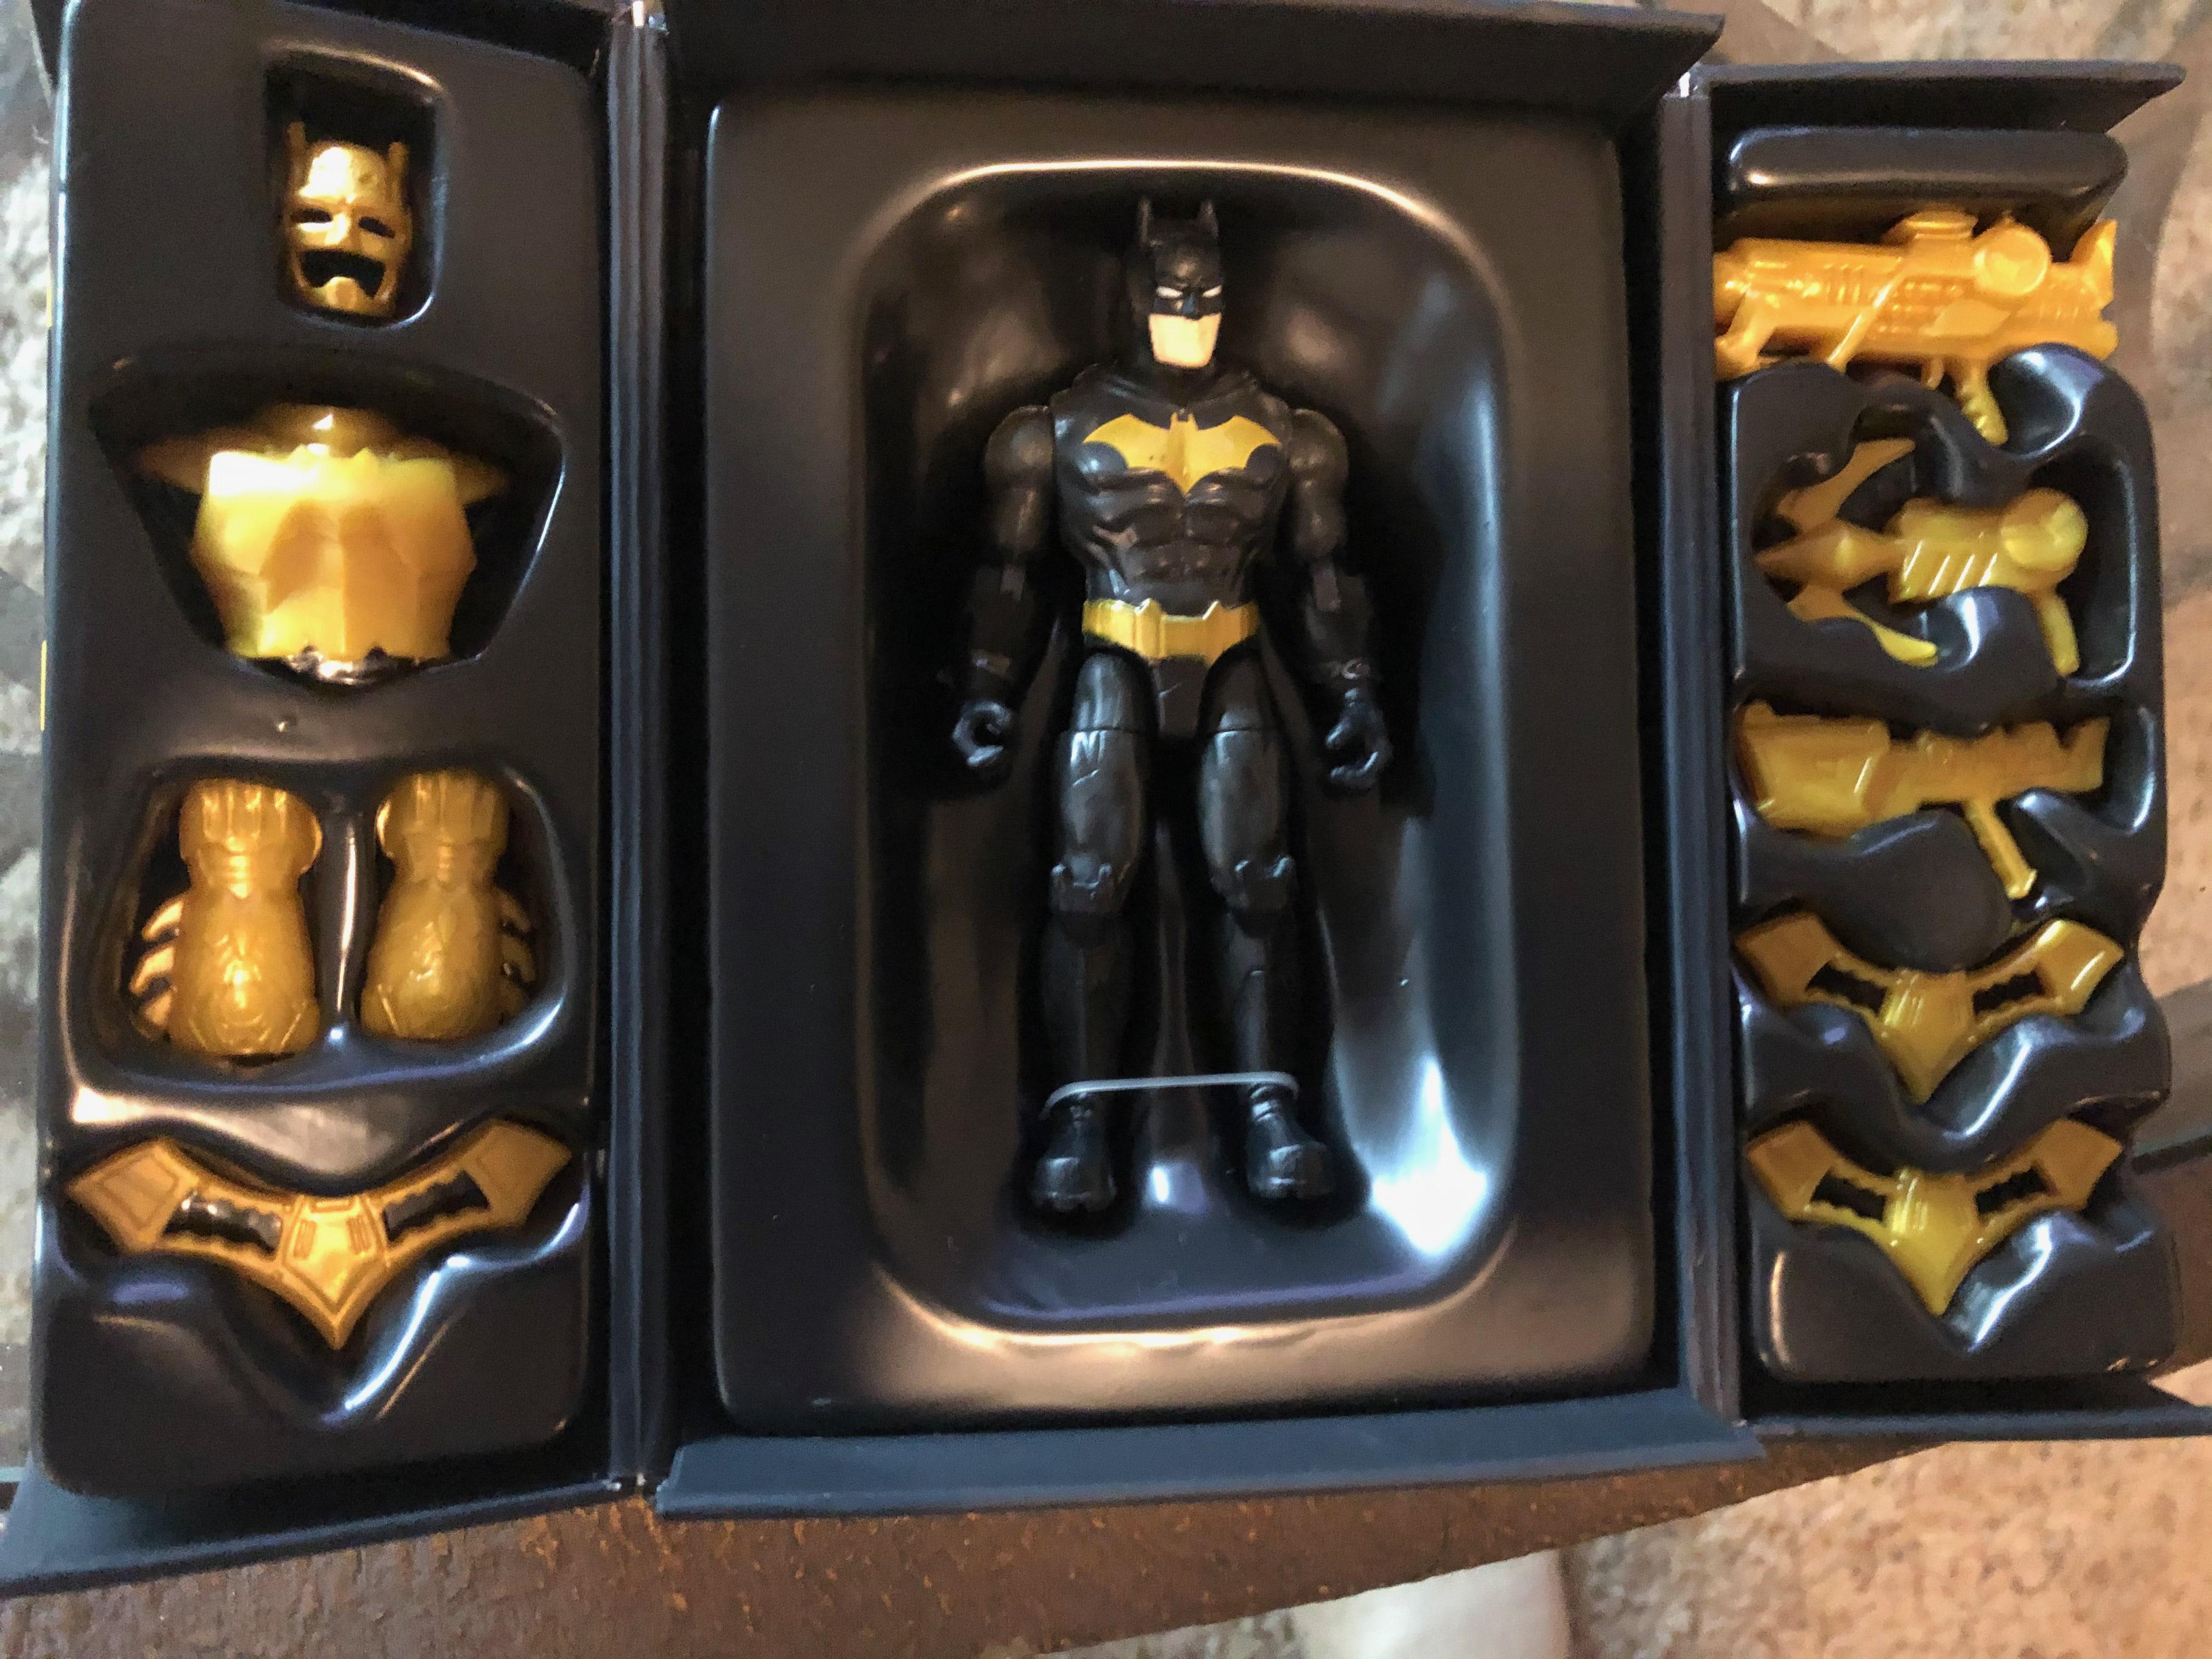 Geek insider, geekinsider, geekinsider. Com,, review: spin master's batman collectables, reviews